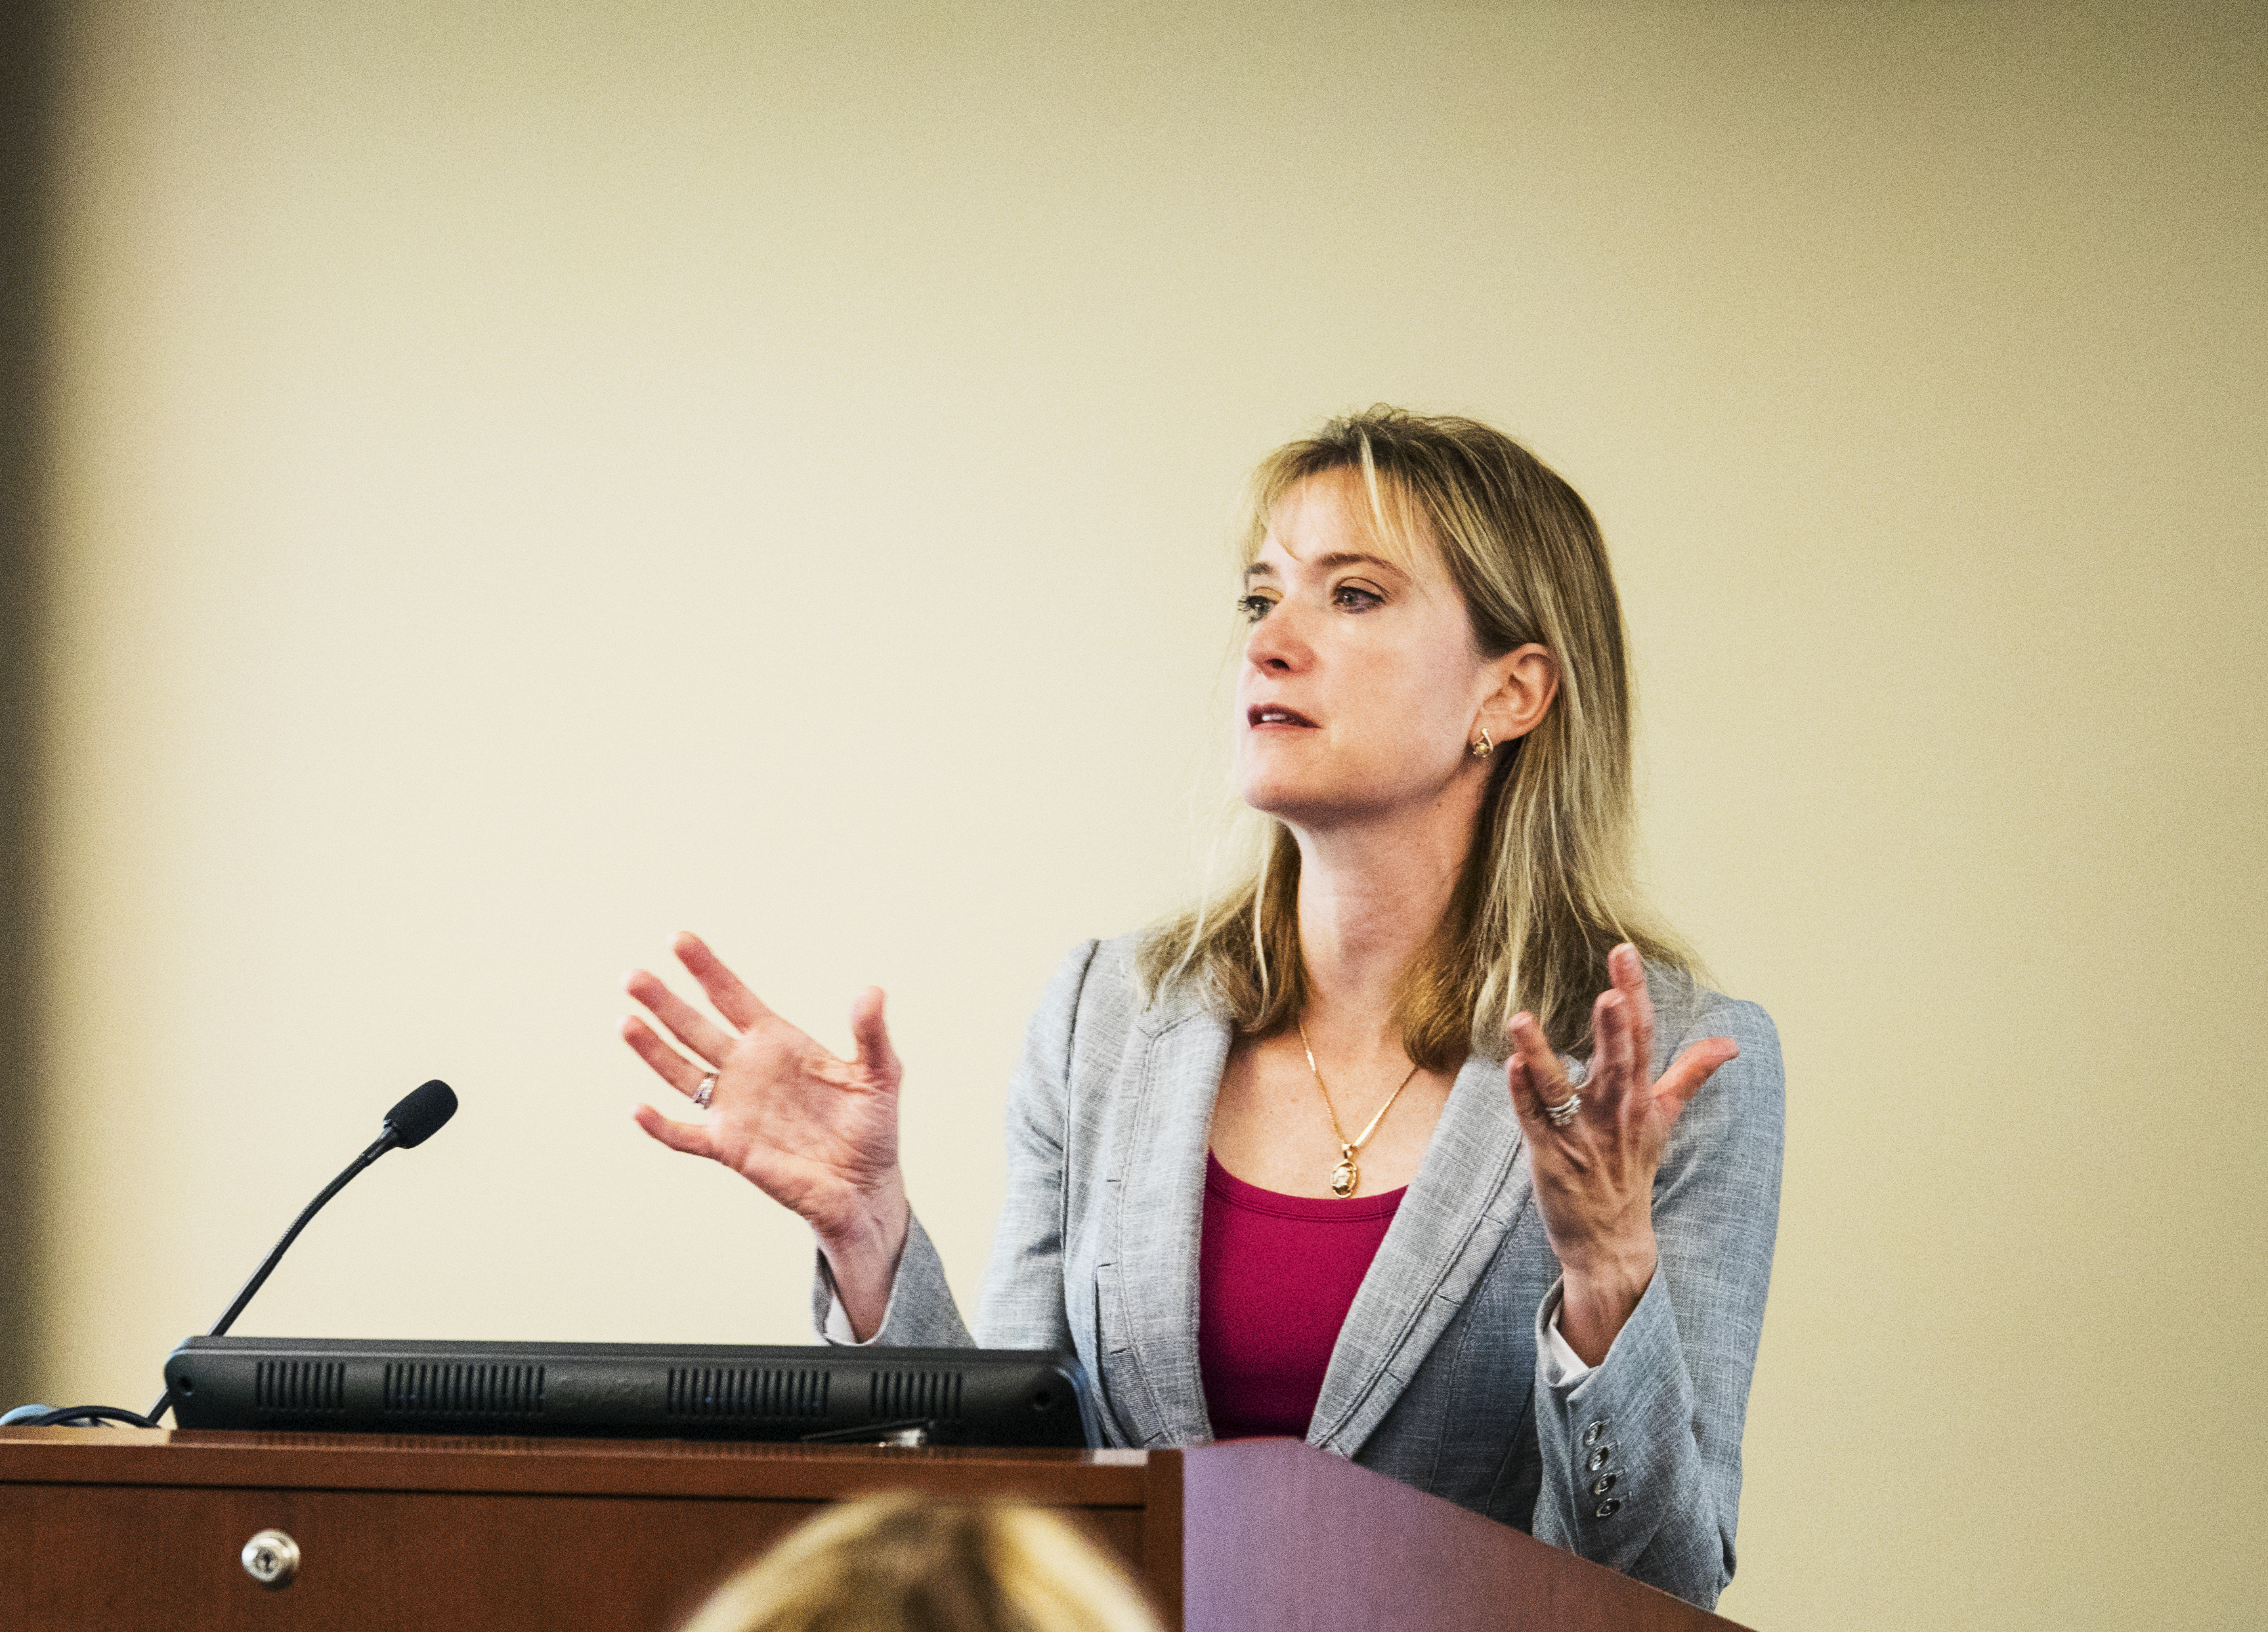 Dr. Caroline Cederquist